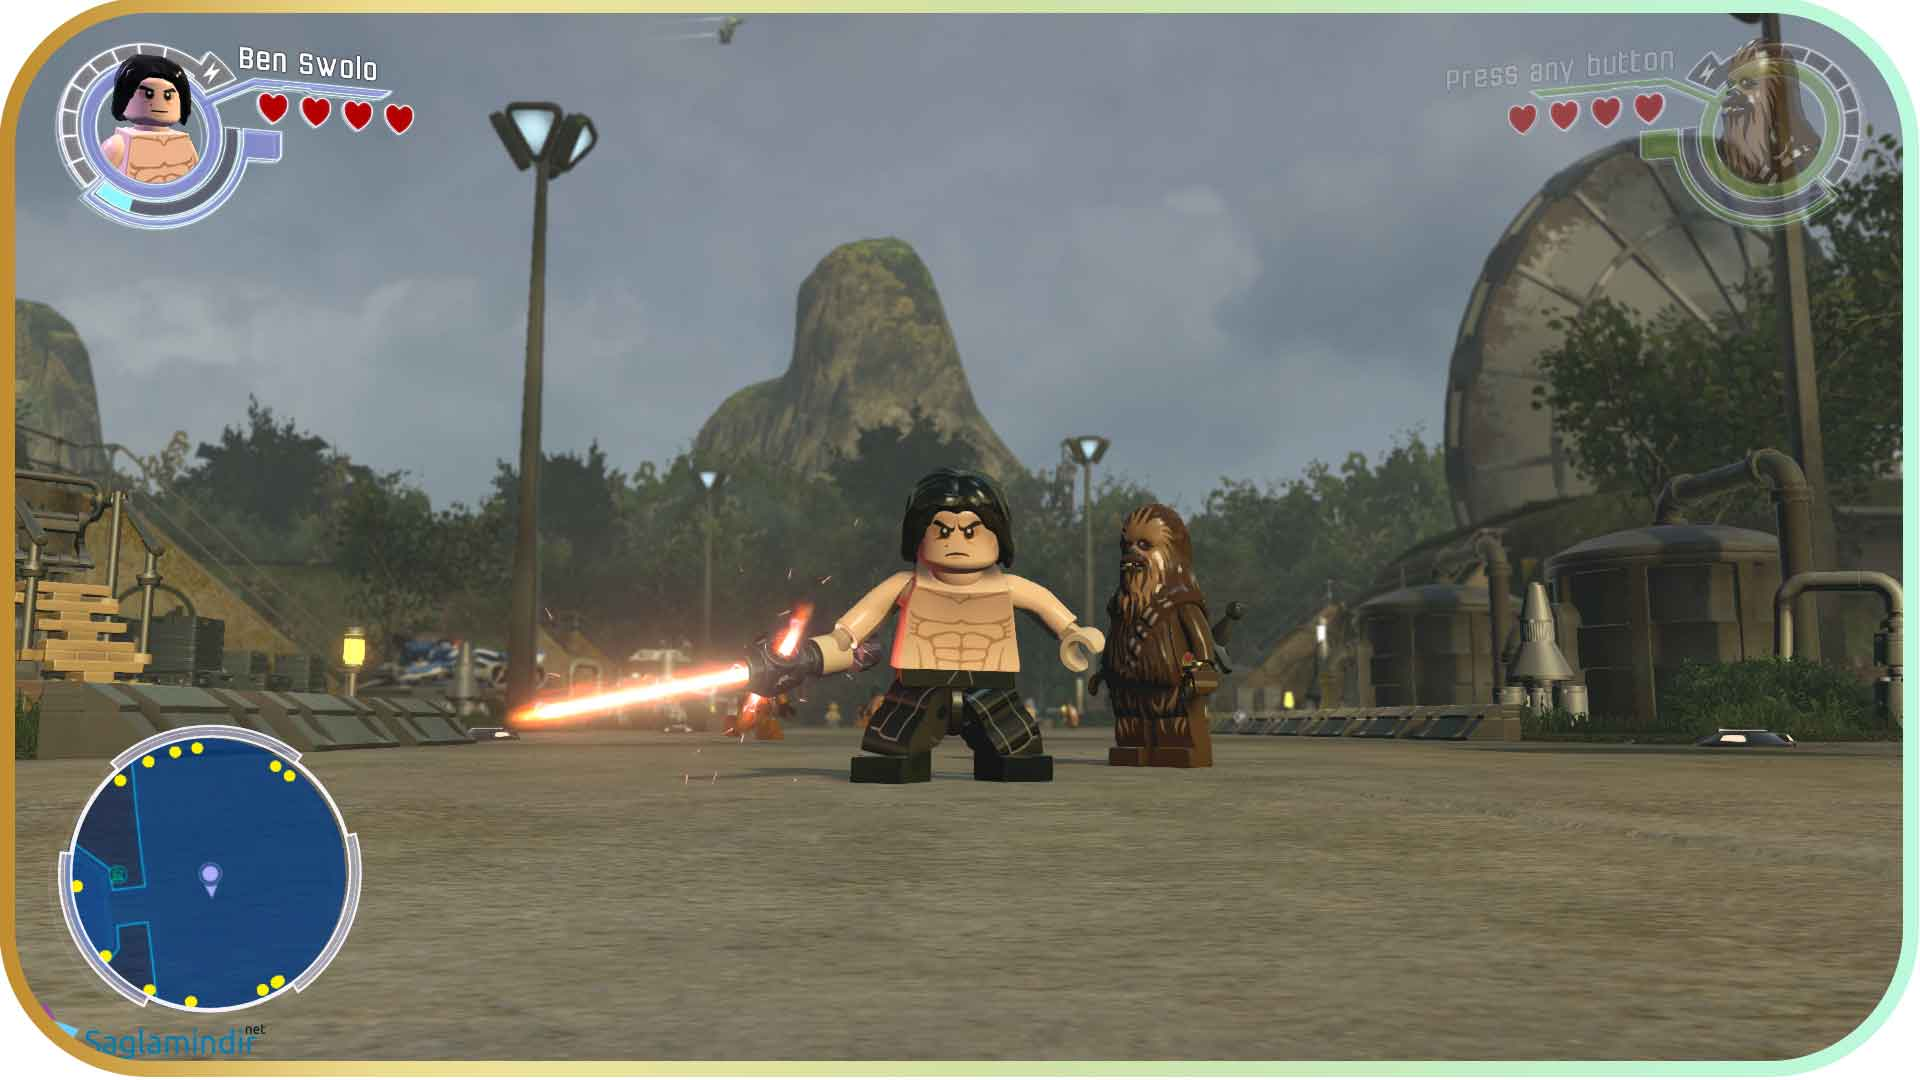 LEGO Star Wars The Force Awakens torrent indir